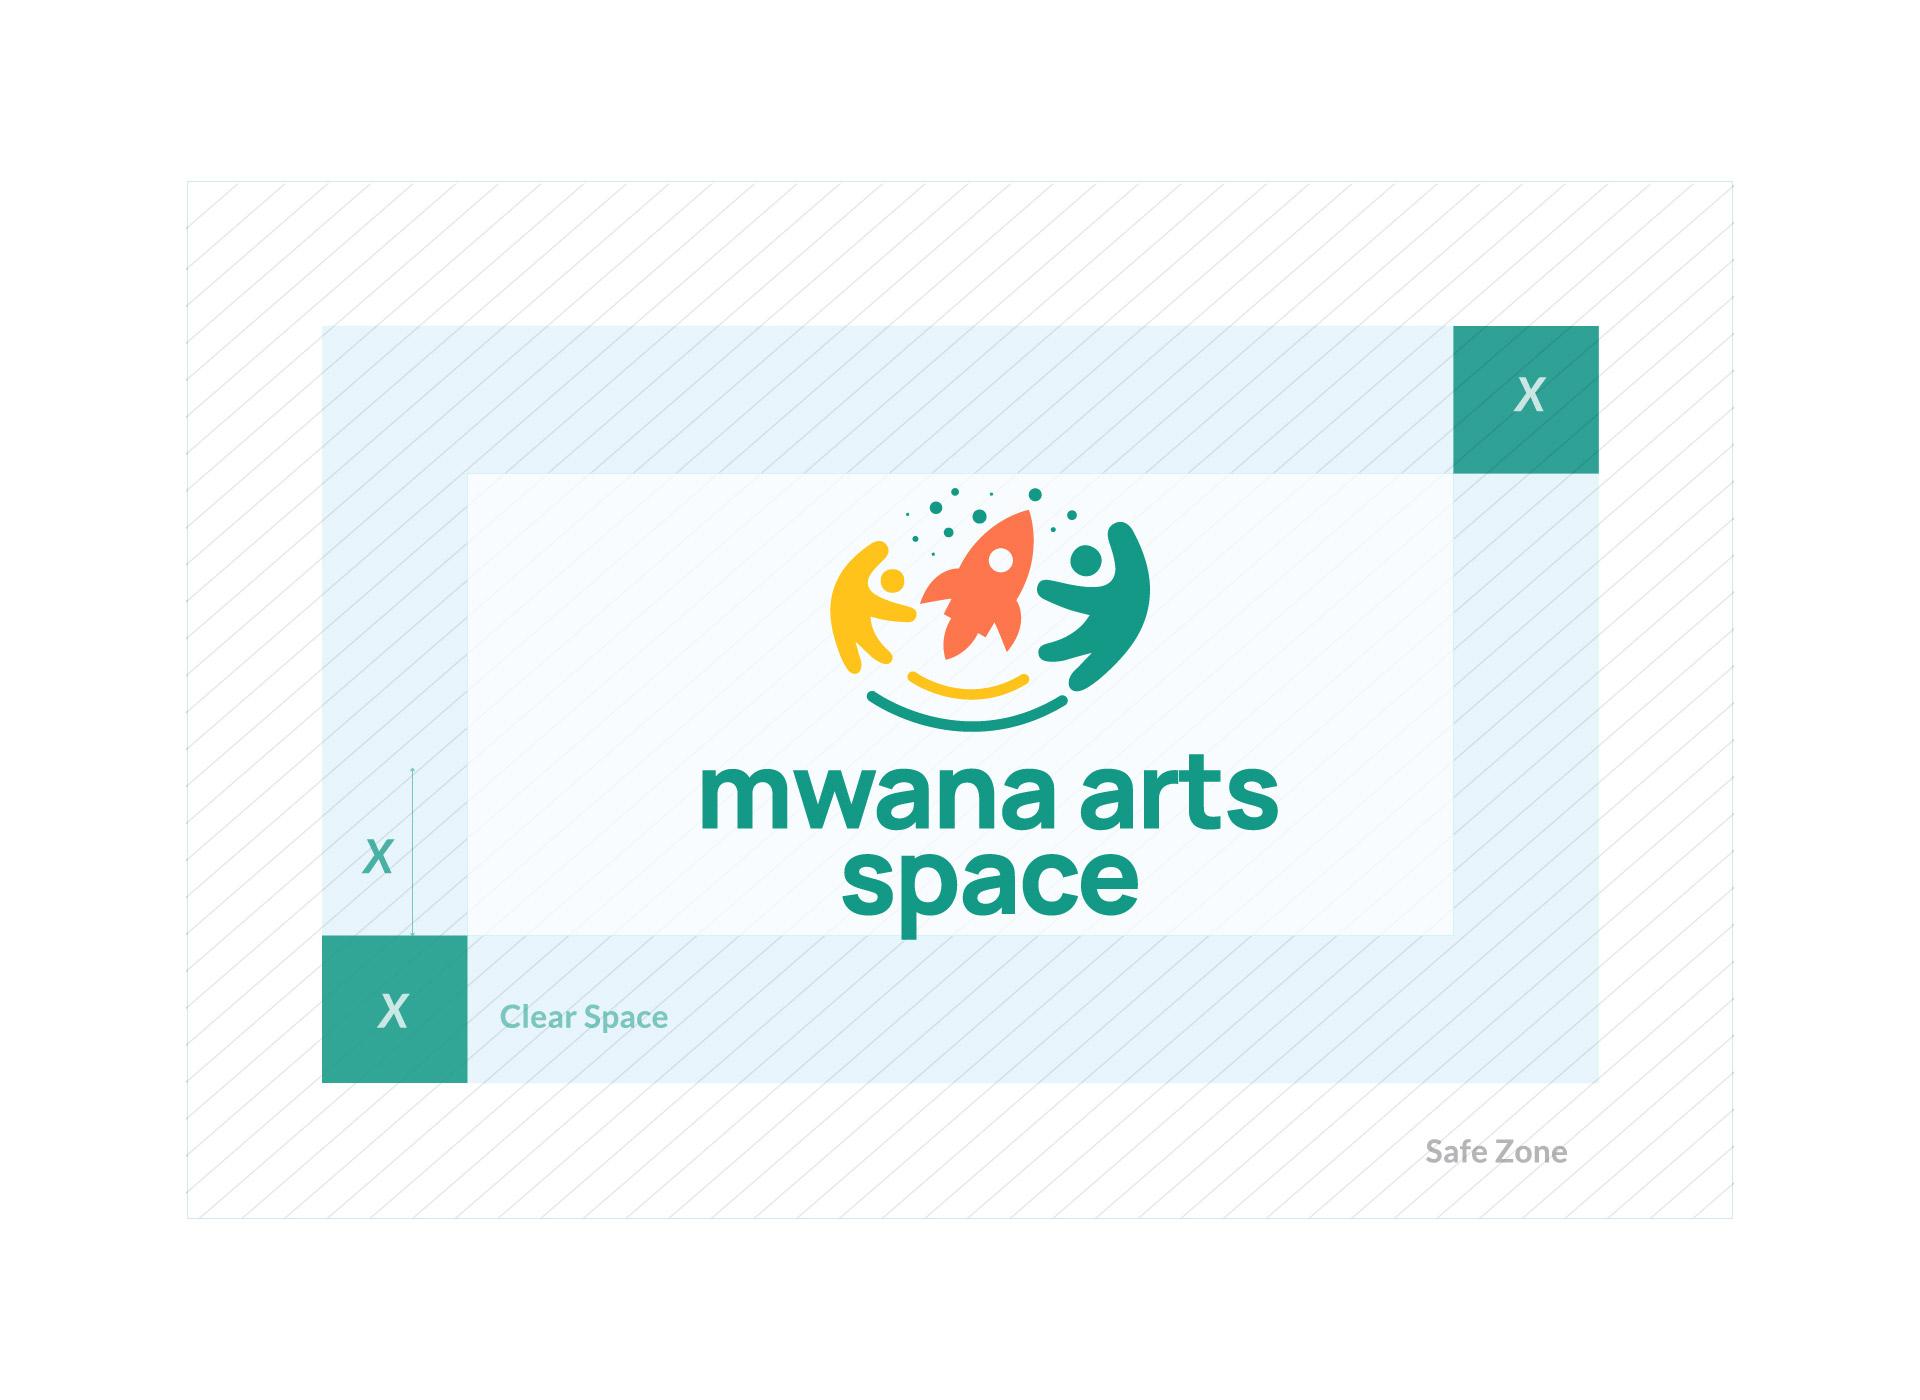 Mwana Arts Space logo dimensions